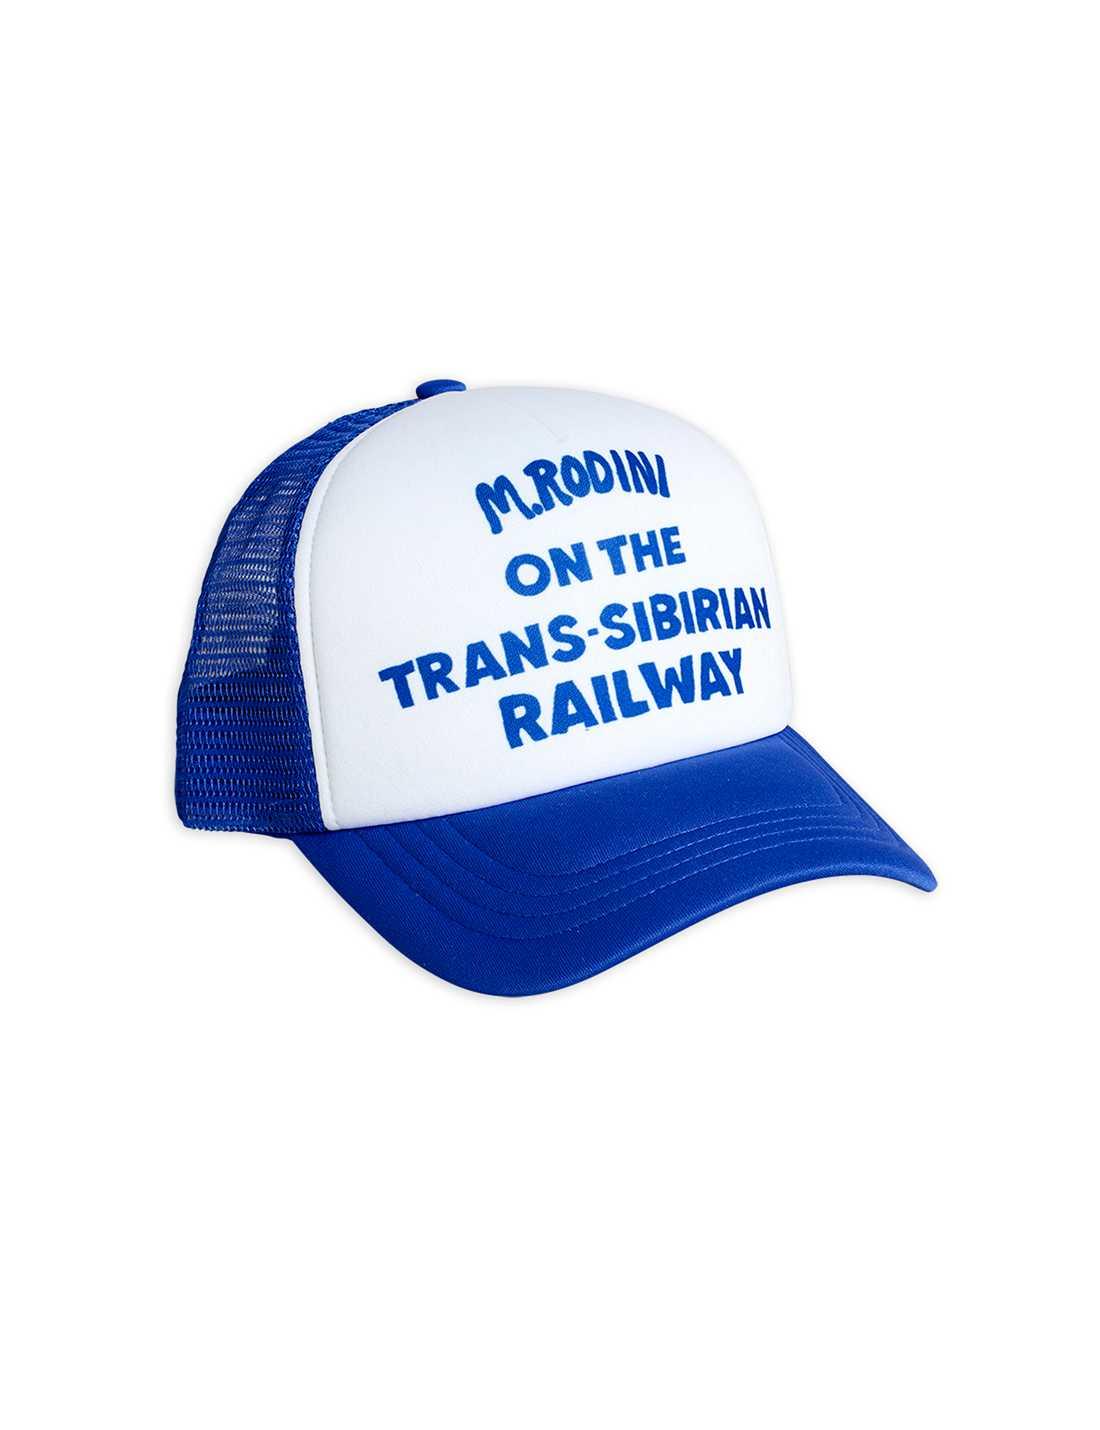 MINI RODINI TRUCKER CAP BLUE